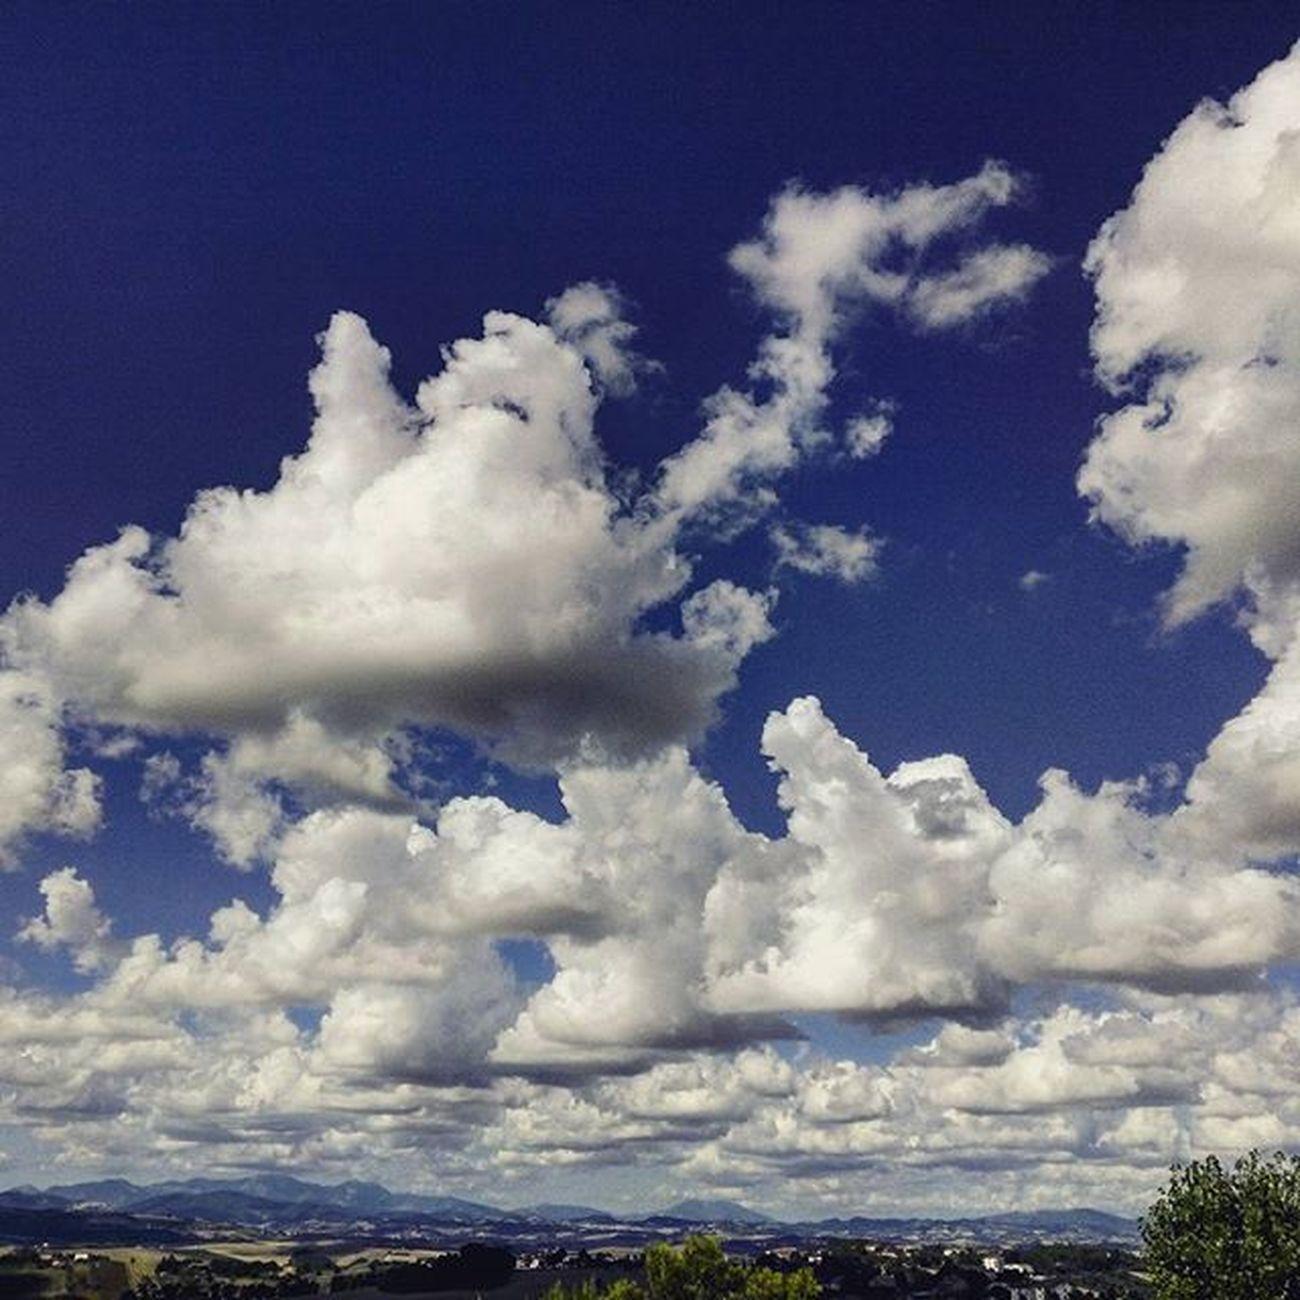 flock of clouds . Nuvole Clouds Cloudscape Cloudslovers Sky SkyClouds Skylovers Cieloazzurro Cielo Blu Bluesky Marche Marcheforyou Italy Italia Liveloveitalia Whatitalyis Landscape Flock